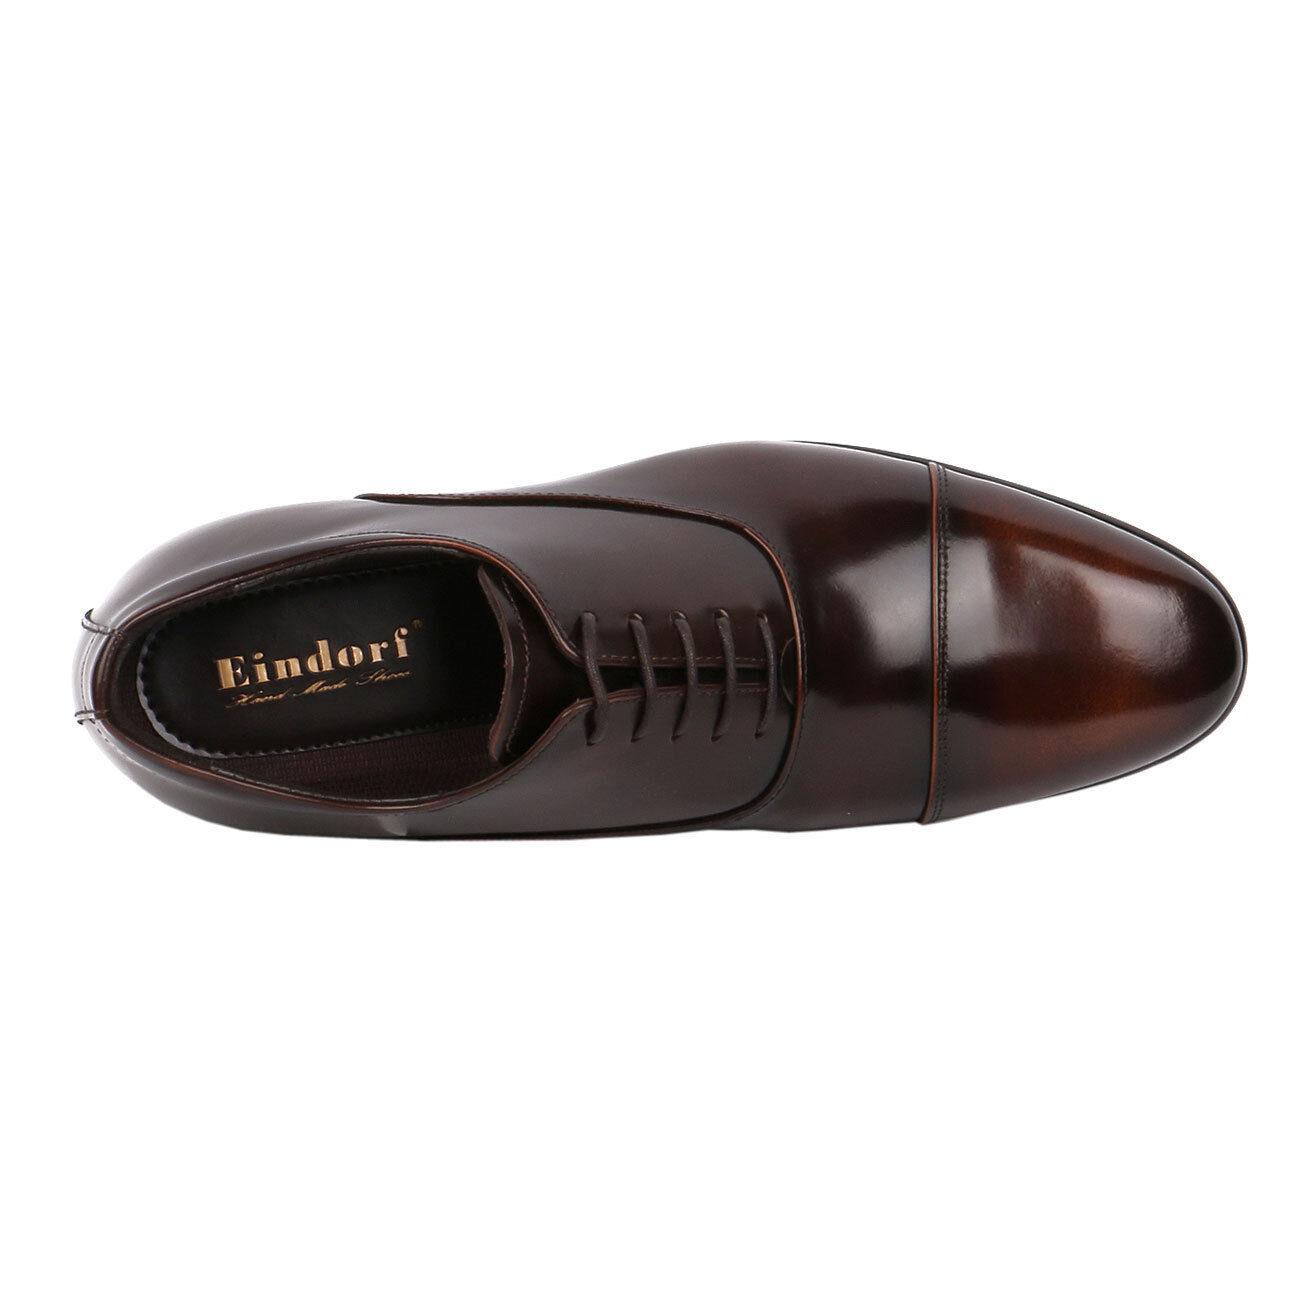 Wide Shoe Two Tone Brown Glossy Formal, Elegant & Dressy 2.8